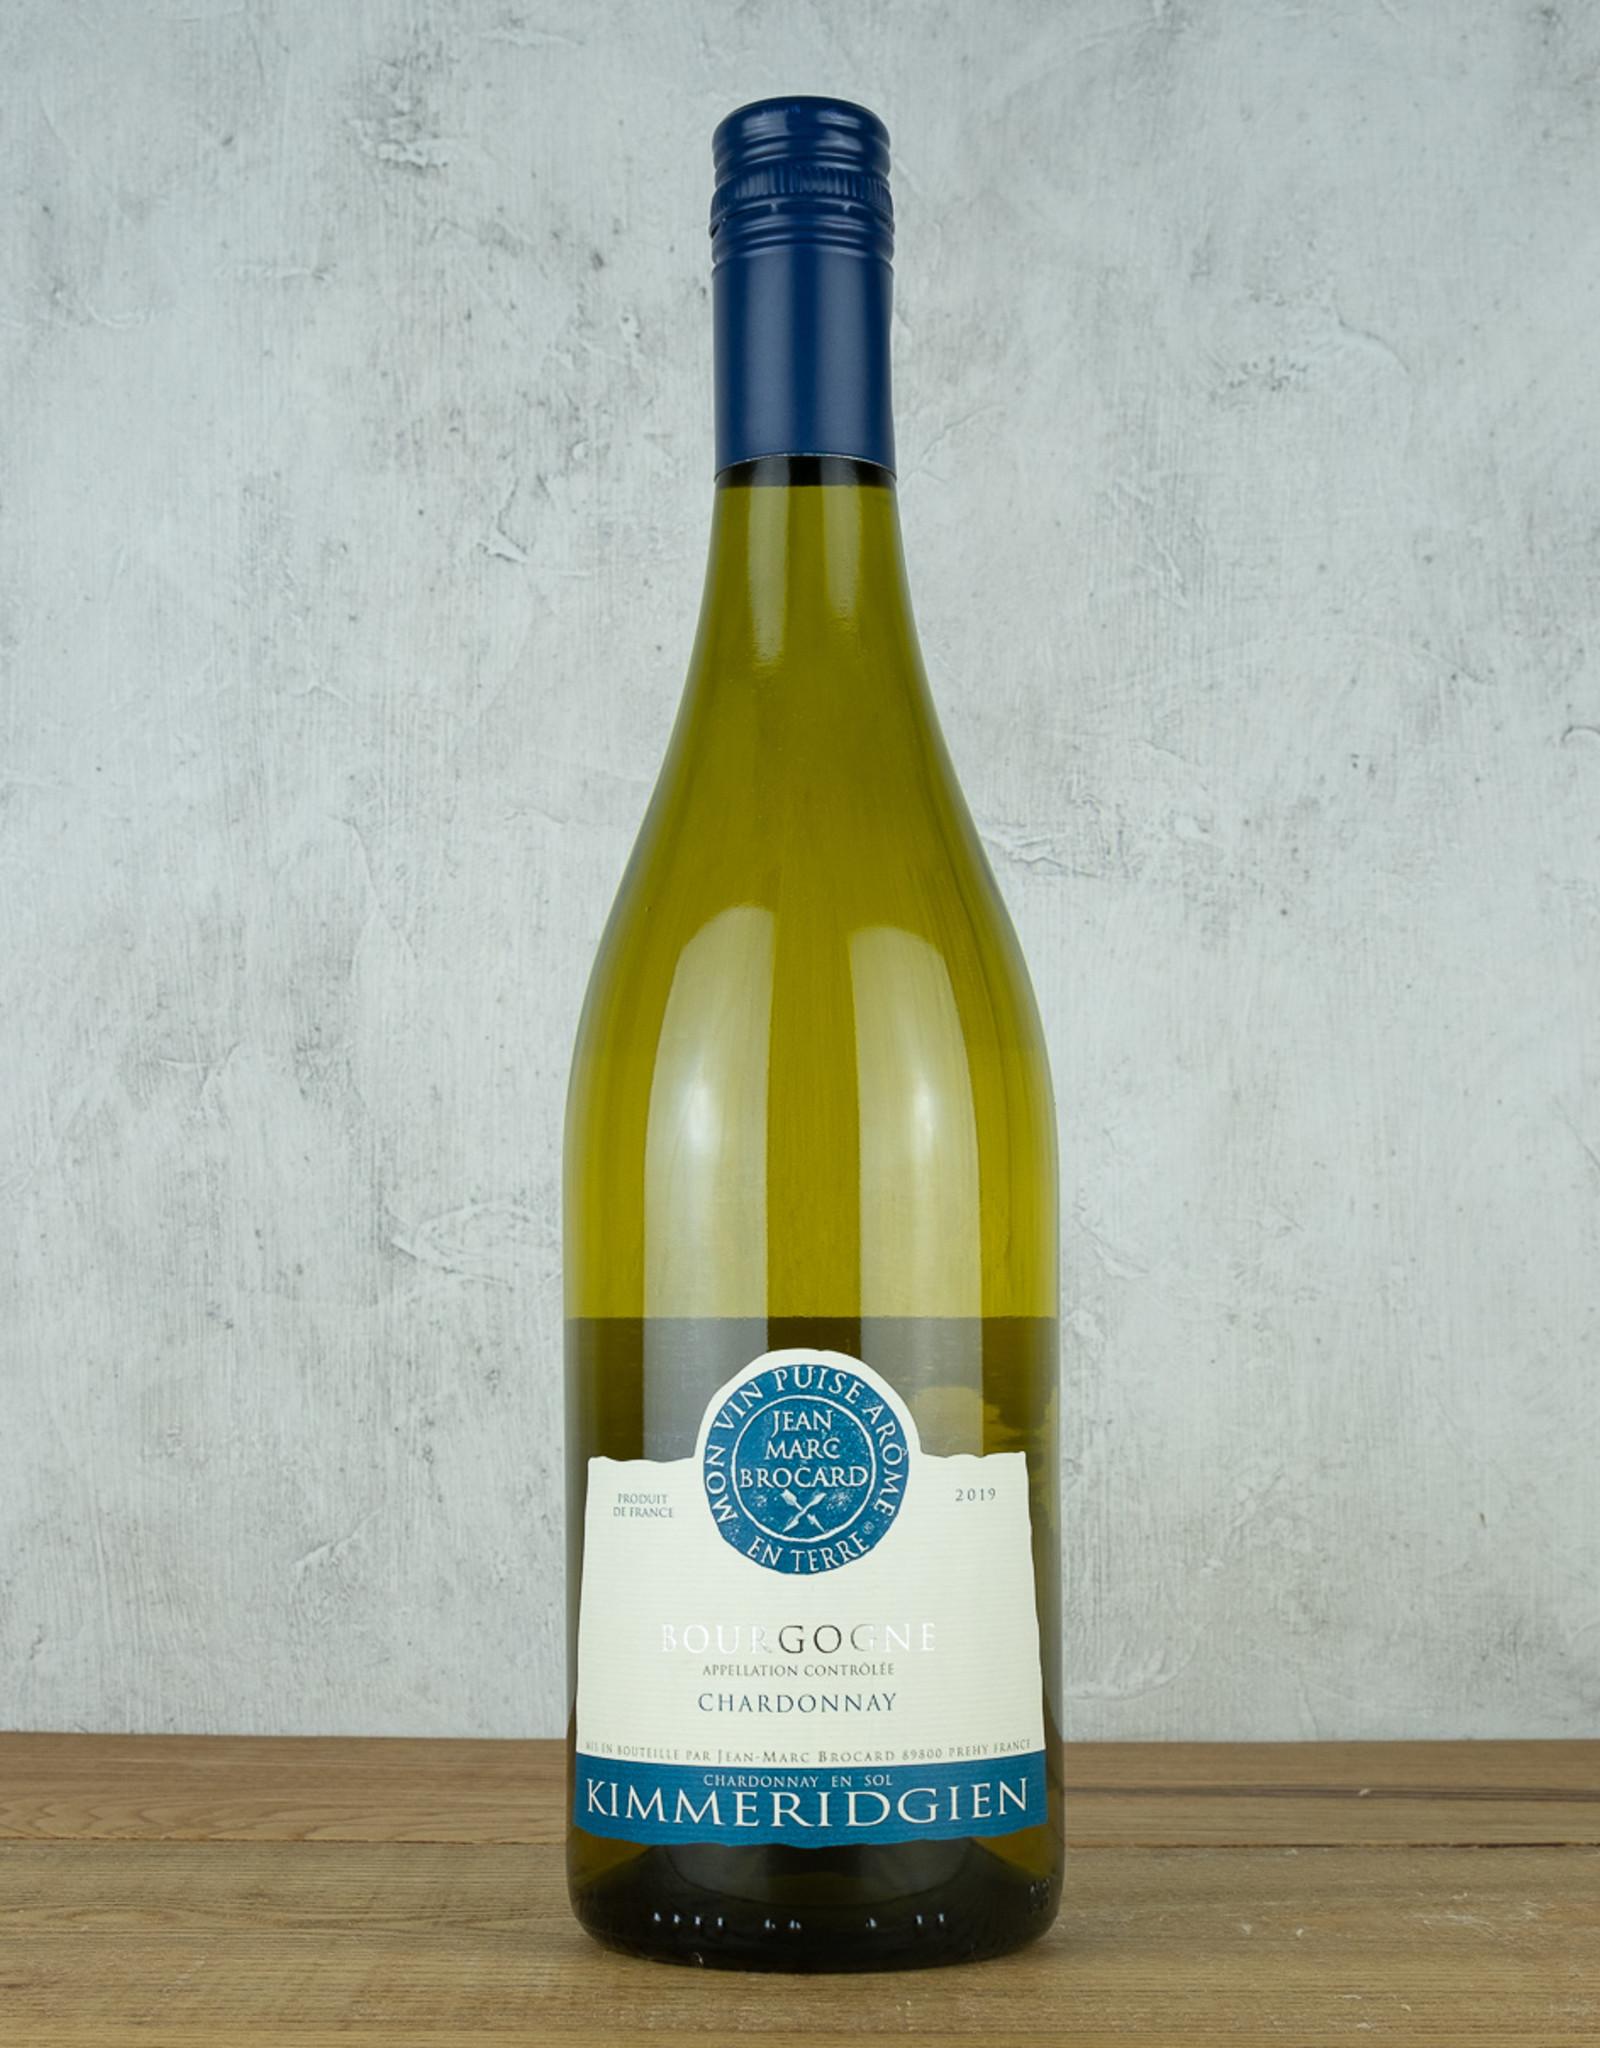 Jean Marc Brocard Kimmeridgien Bourgogne Blanc